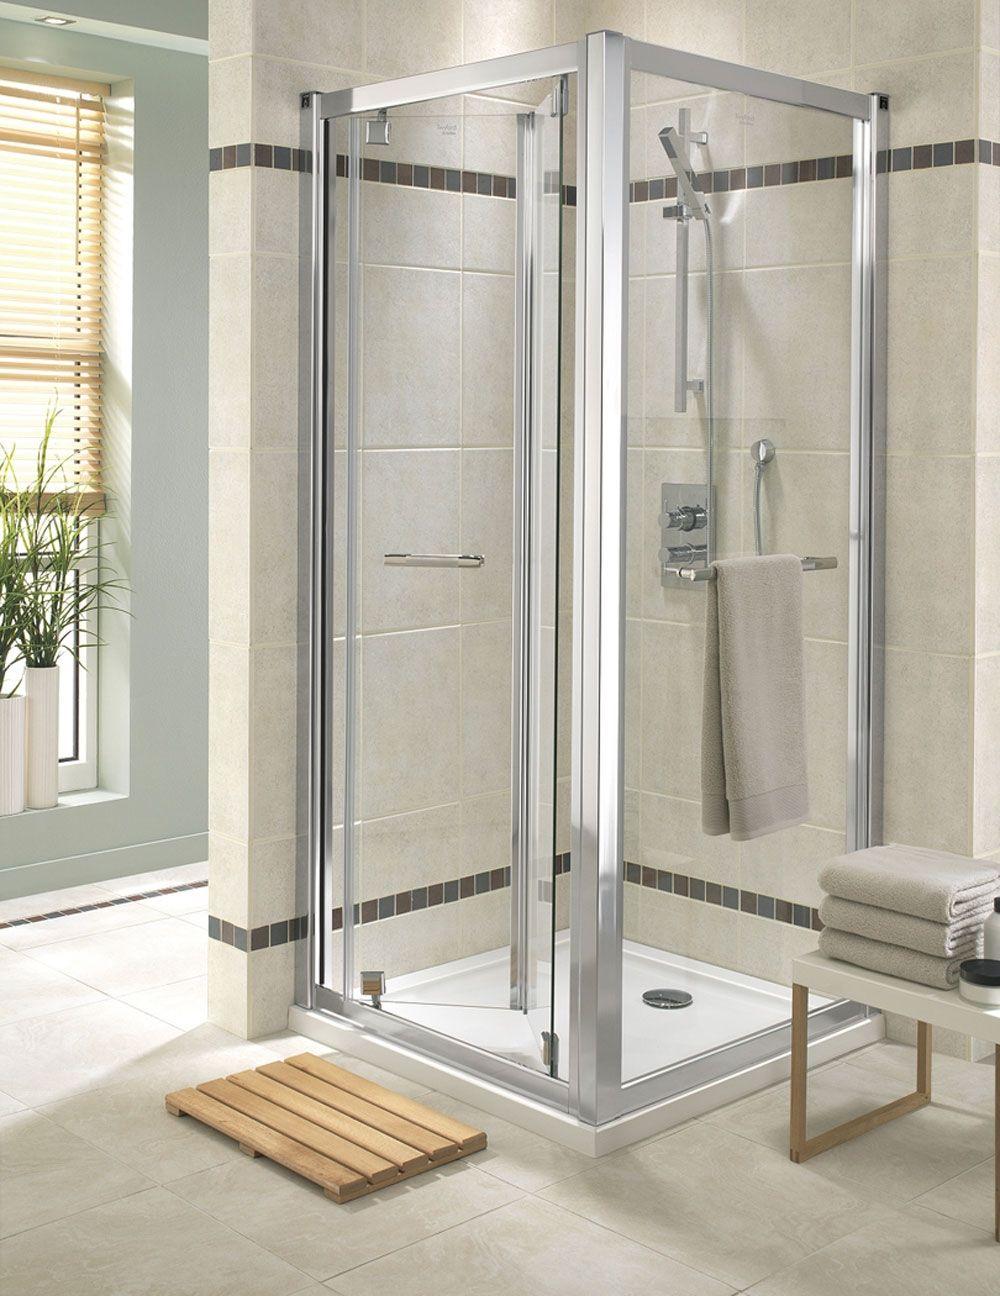 Frameless Glass Shower Door Hinge Adjustment Glass Doors